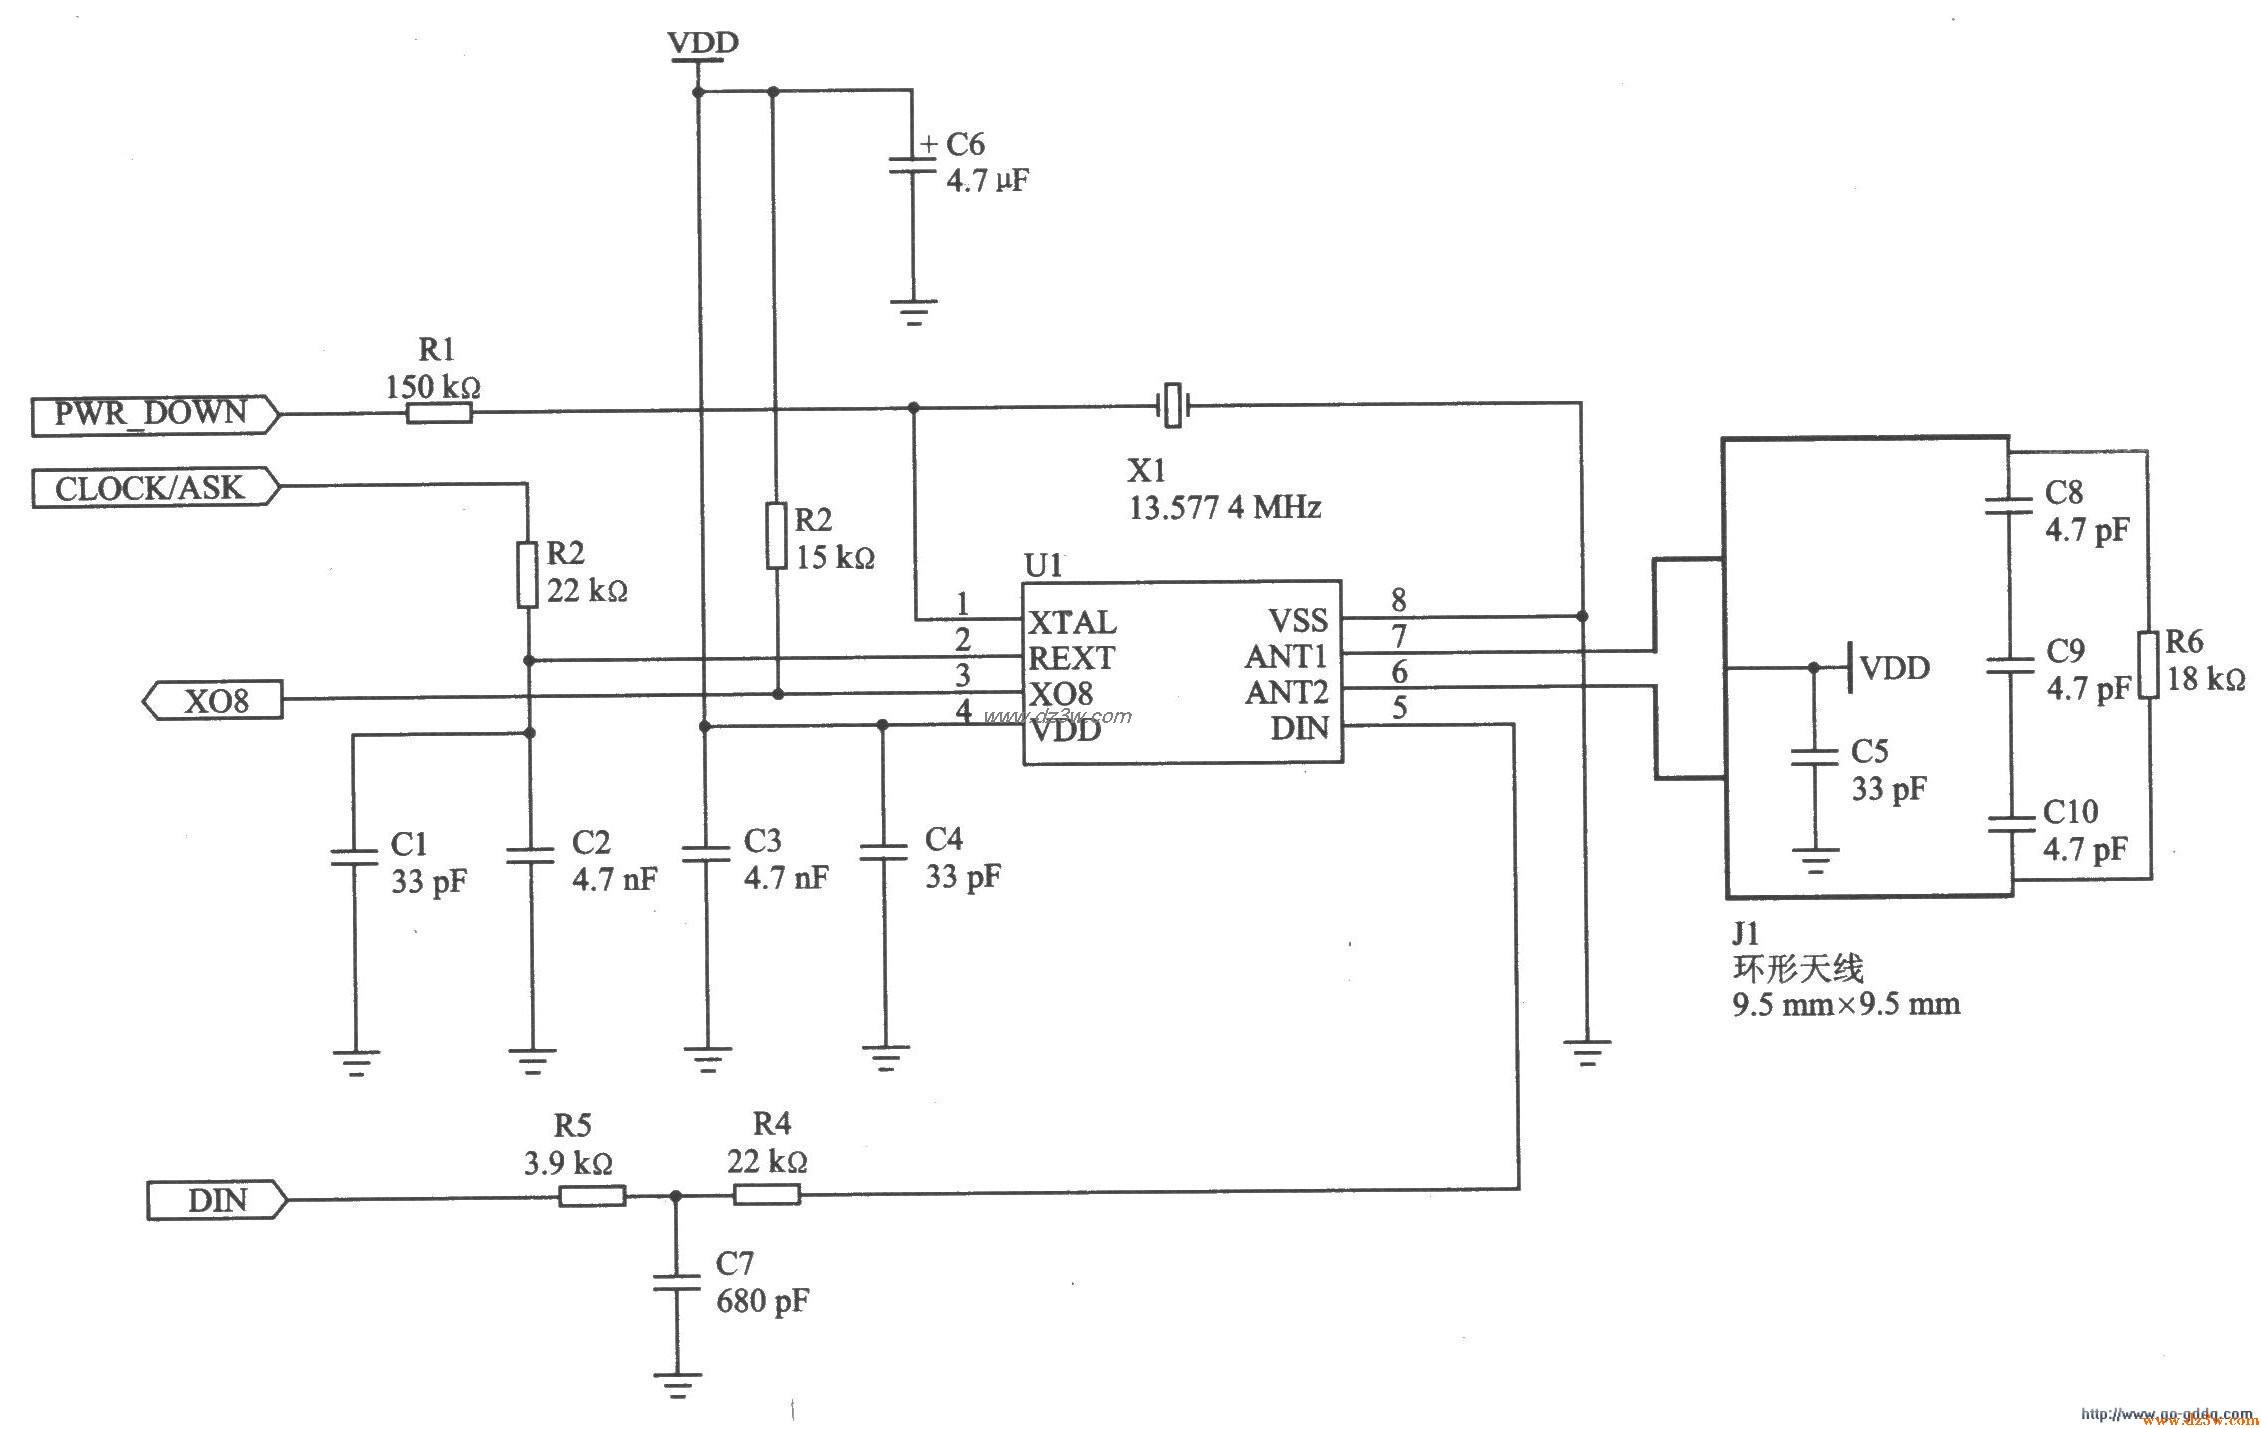 868MHz FSK發射器nRF902應用電路圖 | 研發互助社區